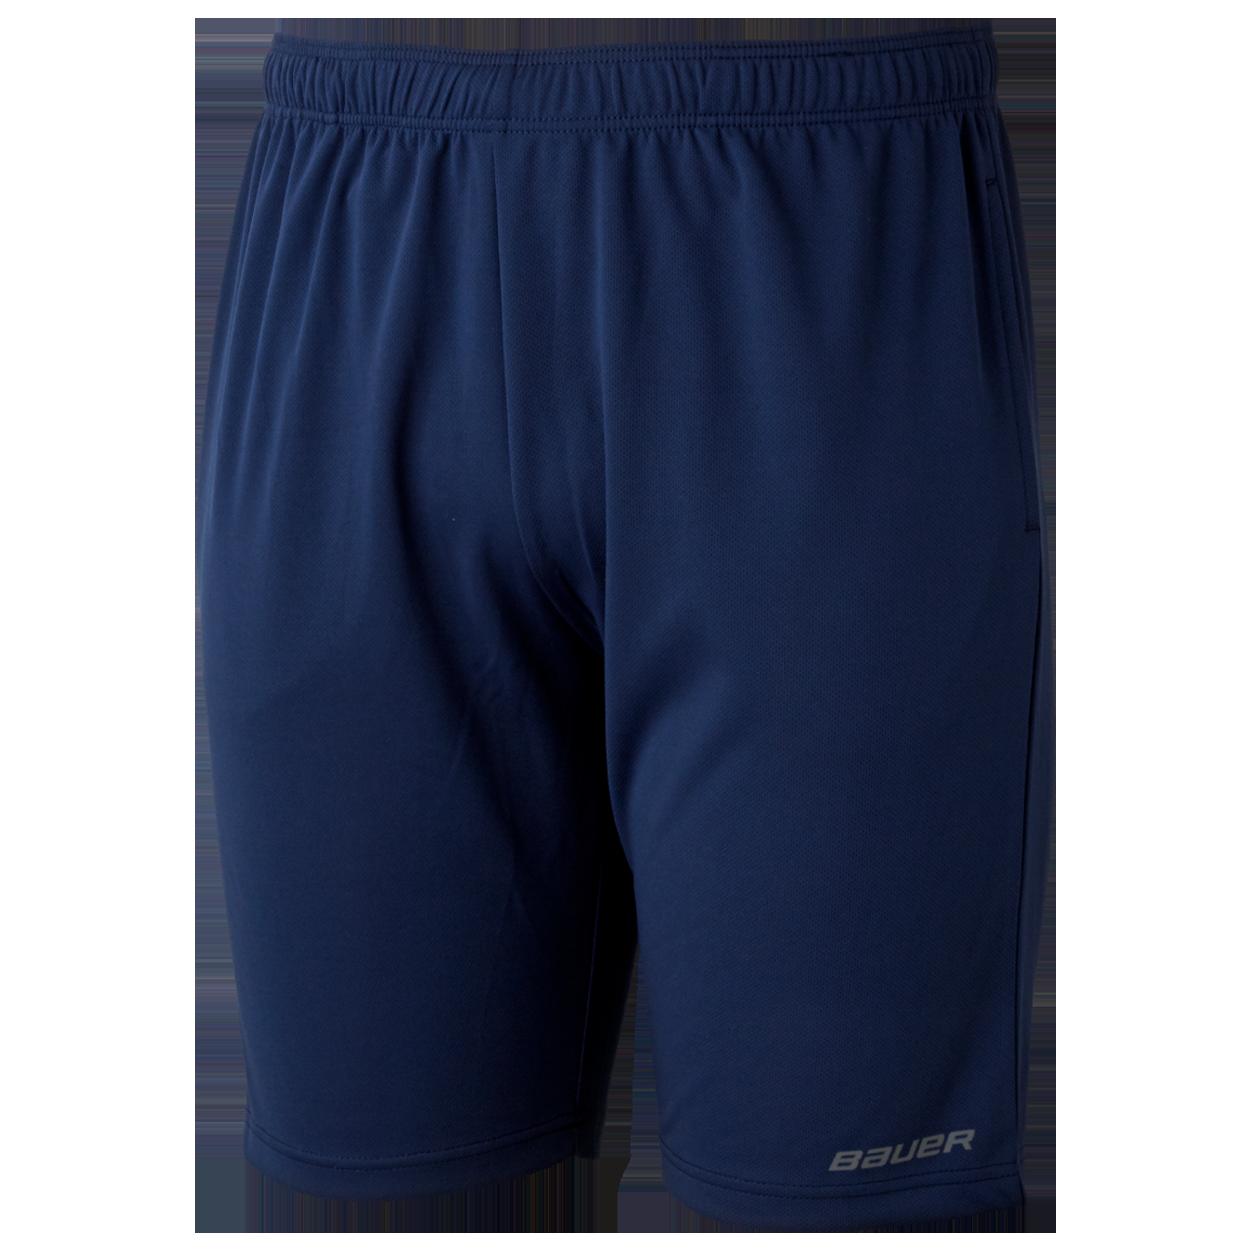 Core Athletic Short Youth - Navy,,medium